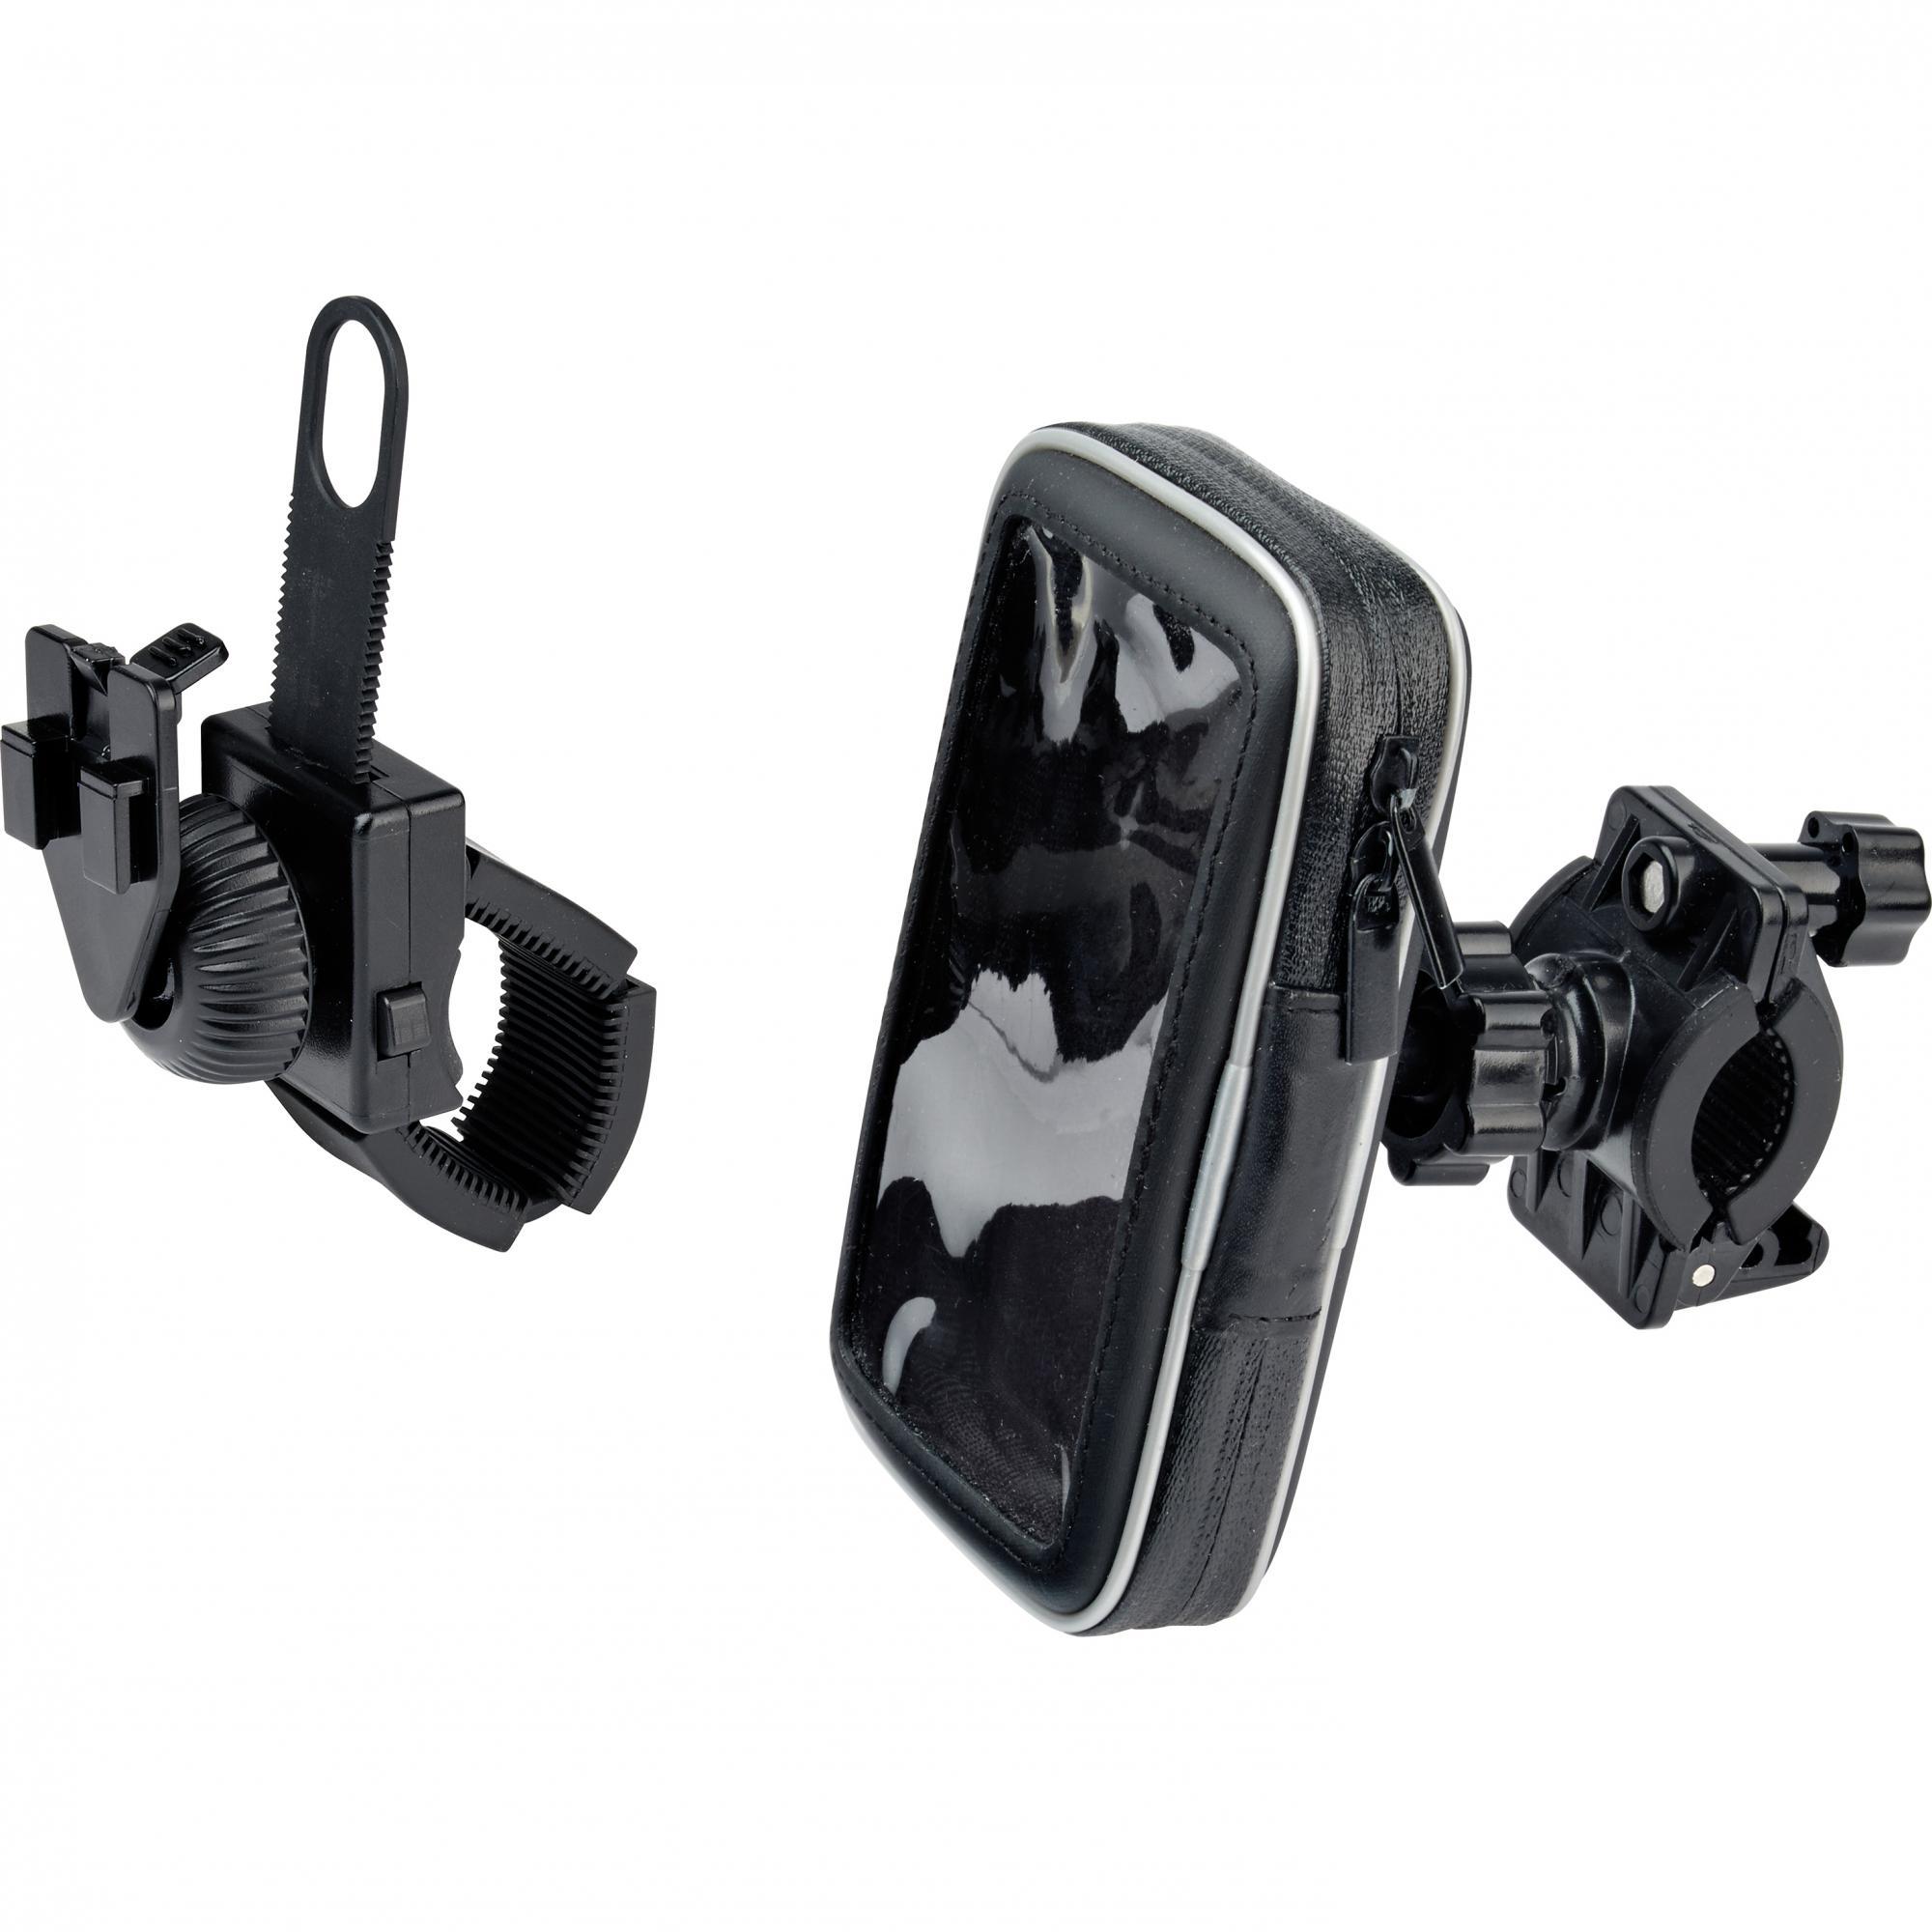 Fotografie Suport de montaj moto Midland MK-IPHONE4 pentru iPhone 4/4S